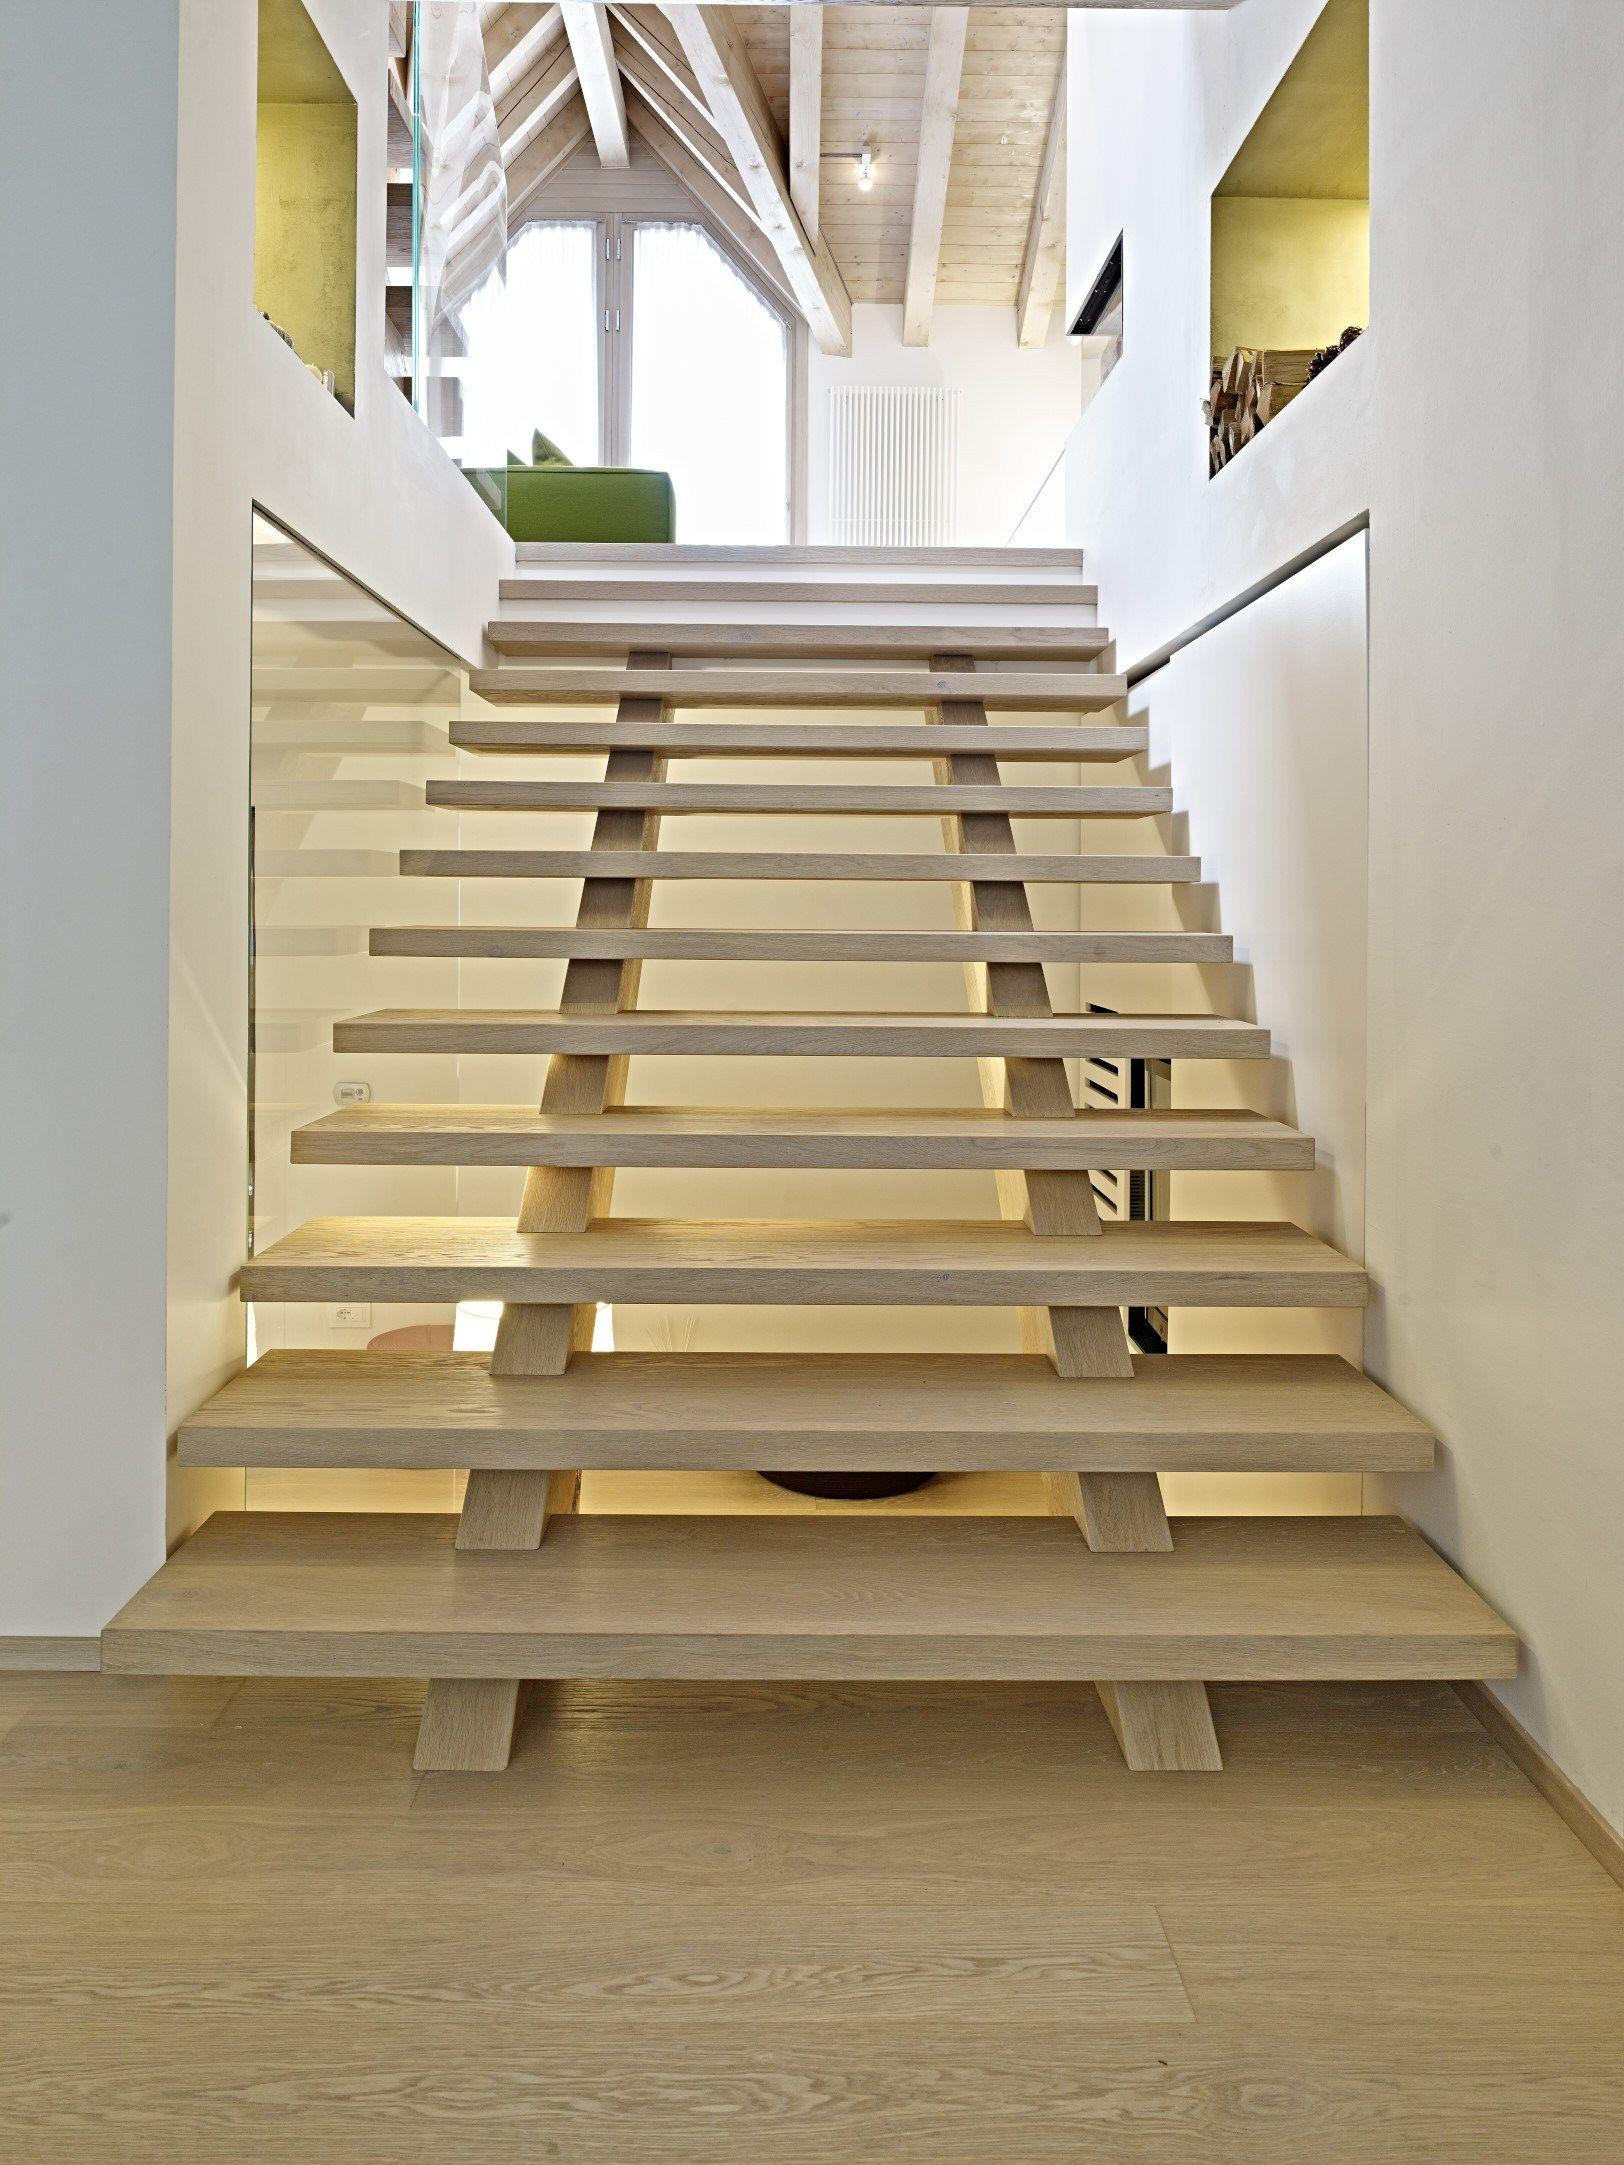 Disegnodilegno escada aberta by fiemme 3000 by d.k.z.